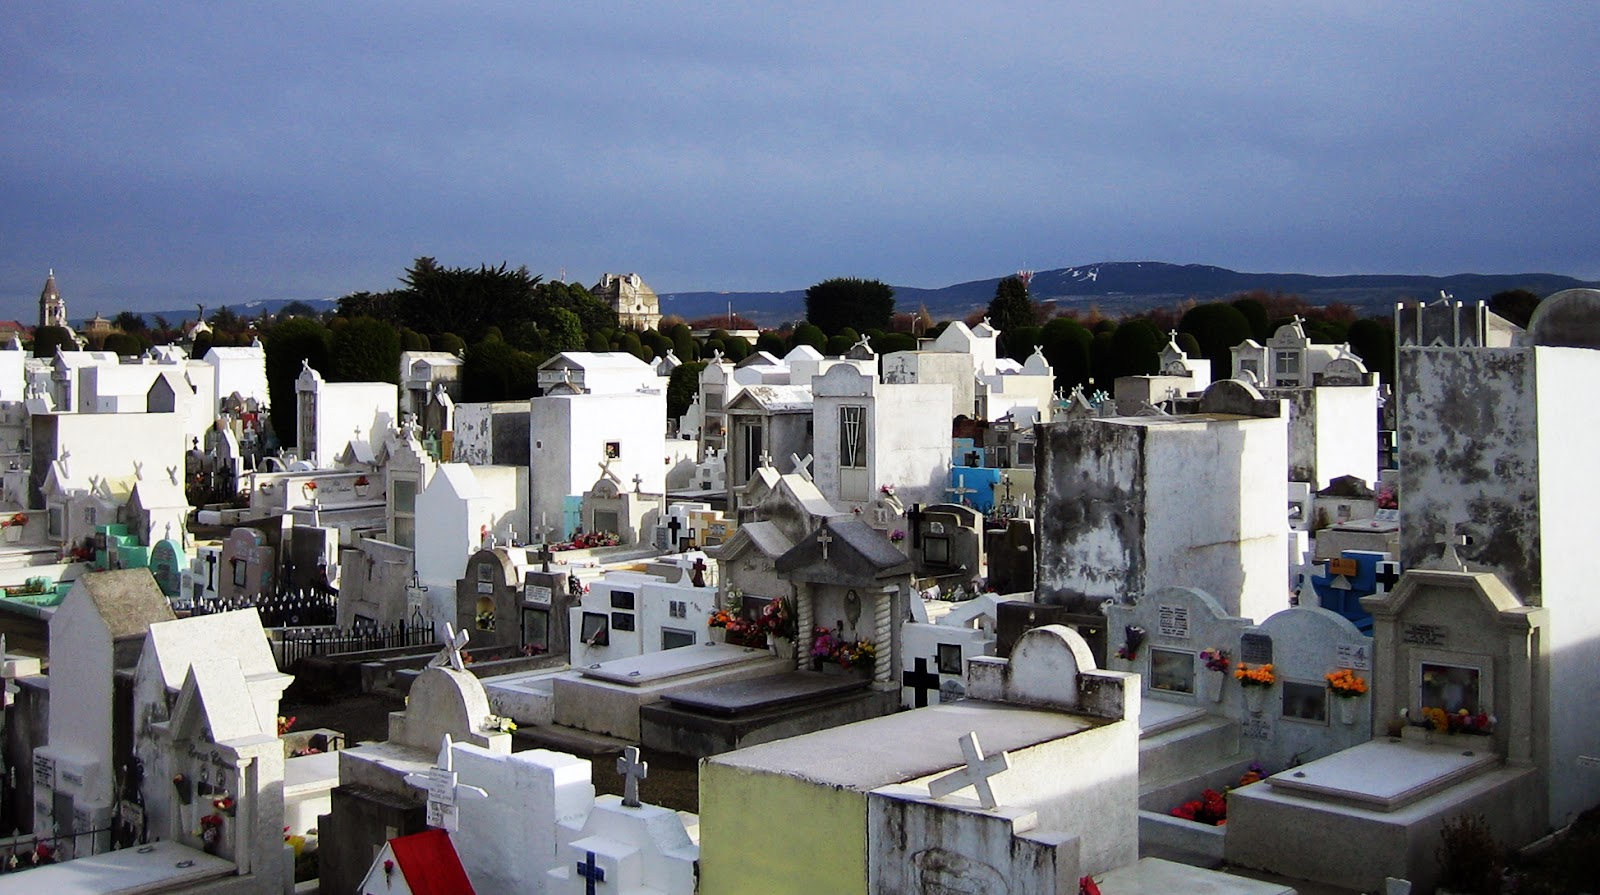 Punta_Arenas_cemetery.jpg